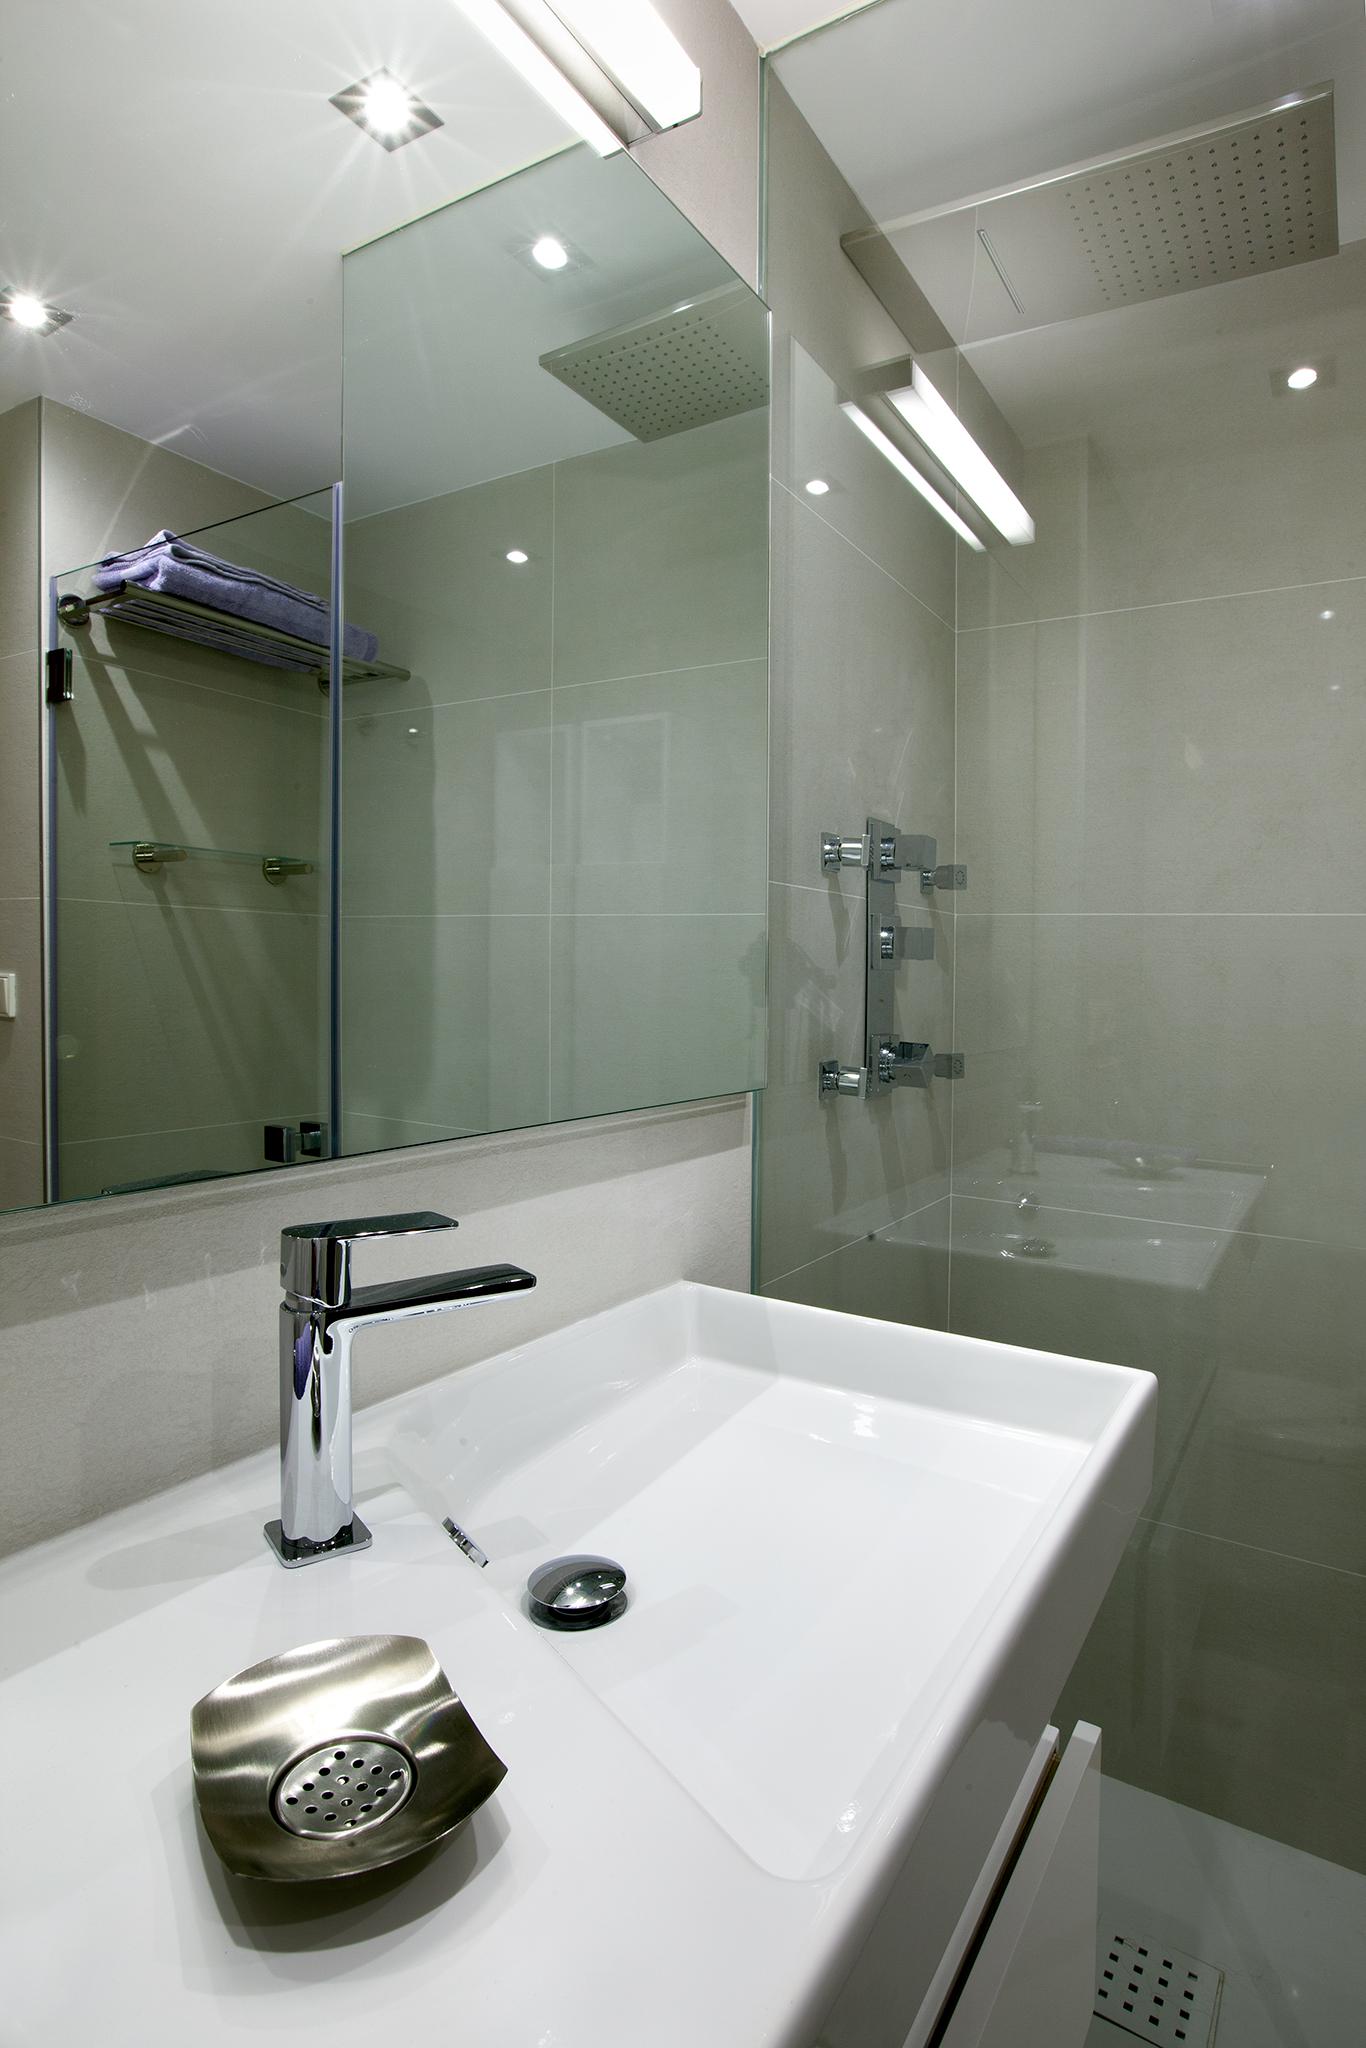 Baño contemporaneo diseño LAGABE Interiorismo (4)